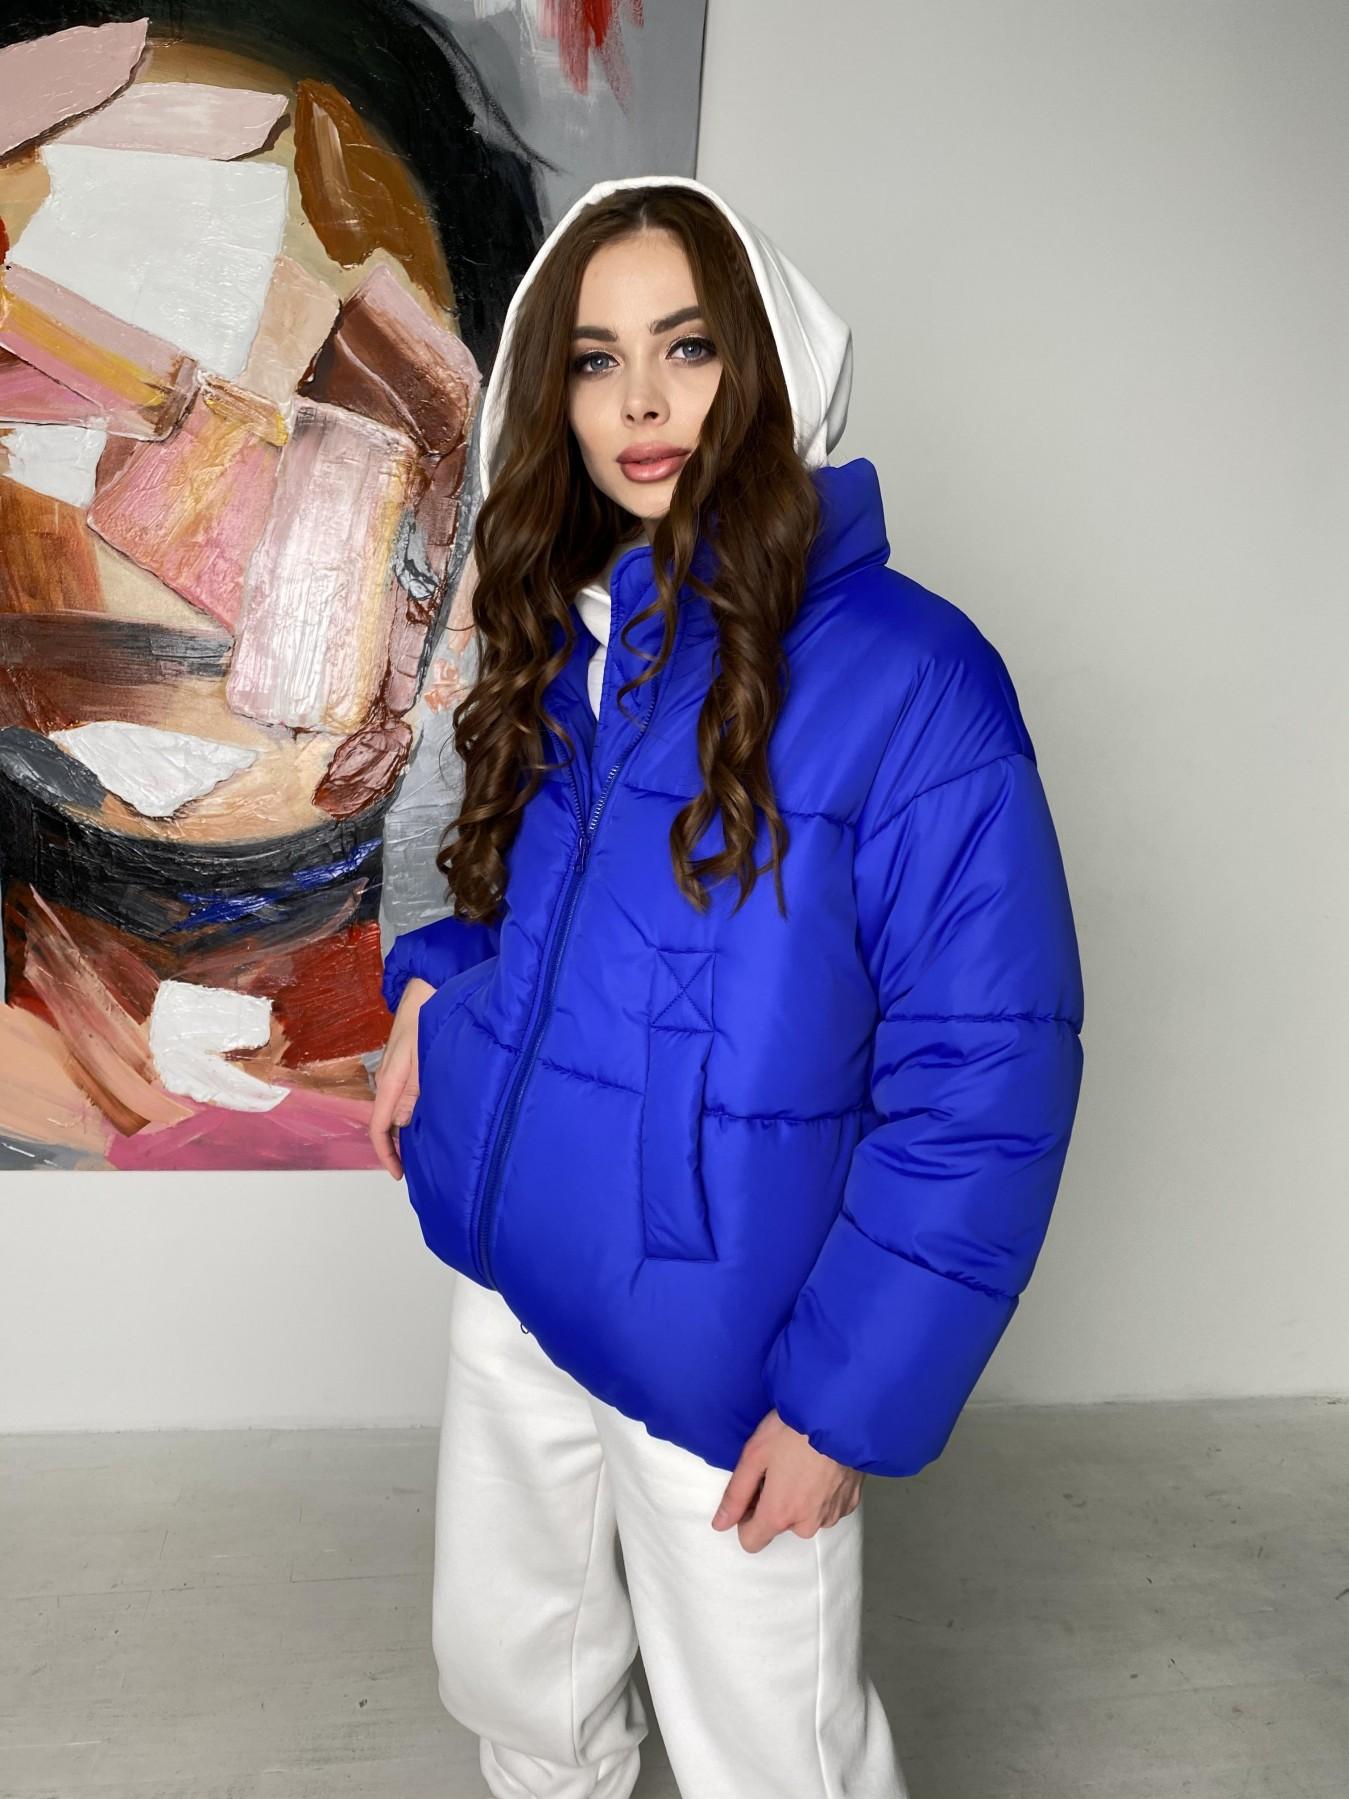 Муд куртка из плащевой ткани 10509 АРТ. 46852 Цвет: Электрик - фото 3, интернет магазин tm-modus.ru